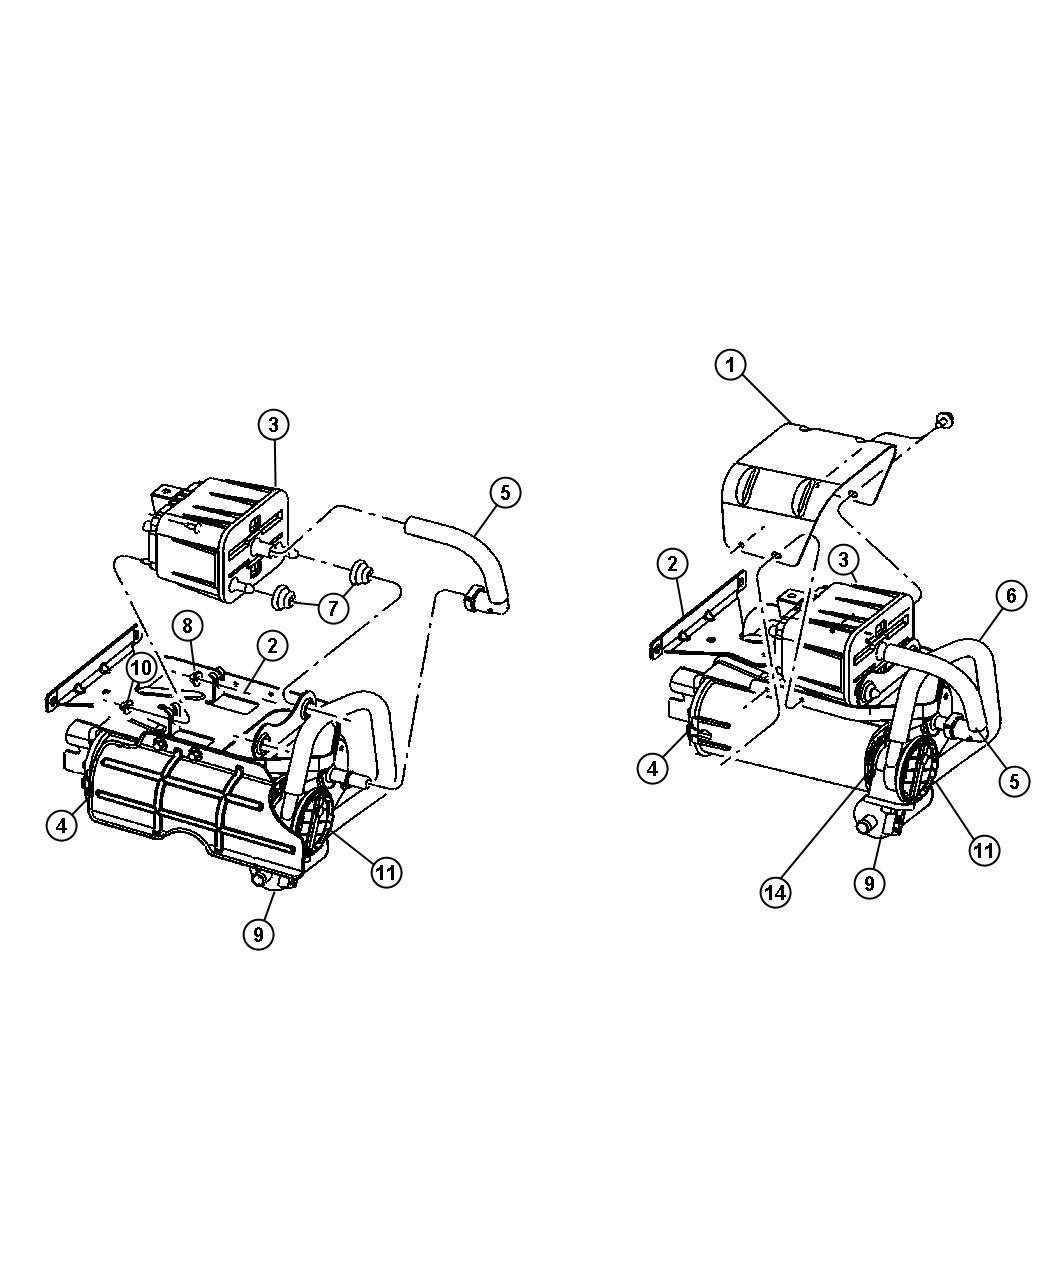 Dodge Ram 1500 Detector. Evaporative system integrity